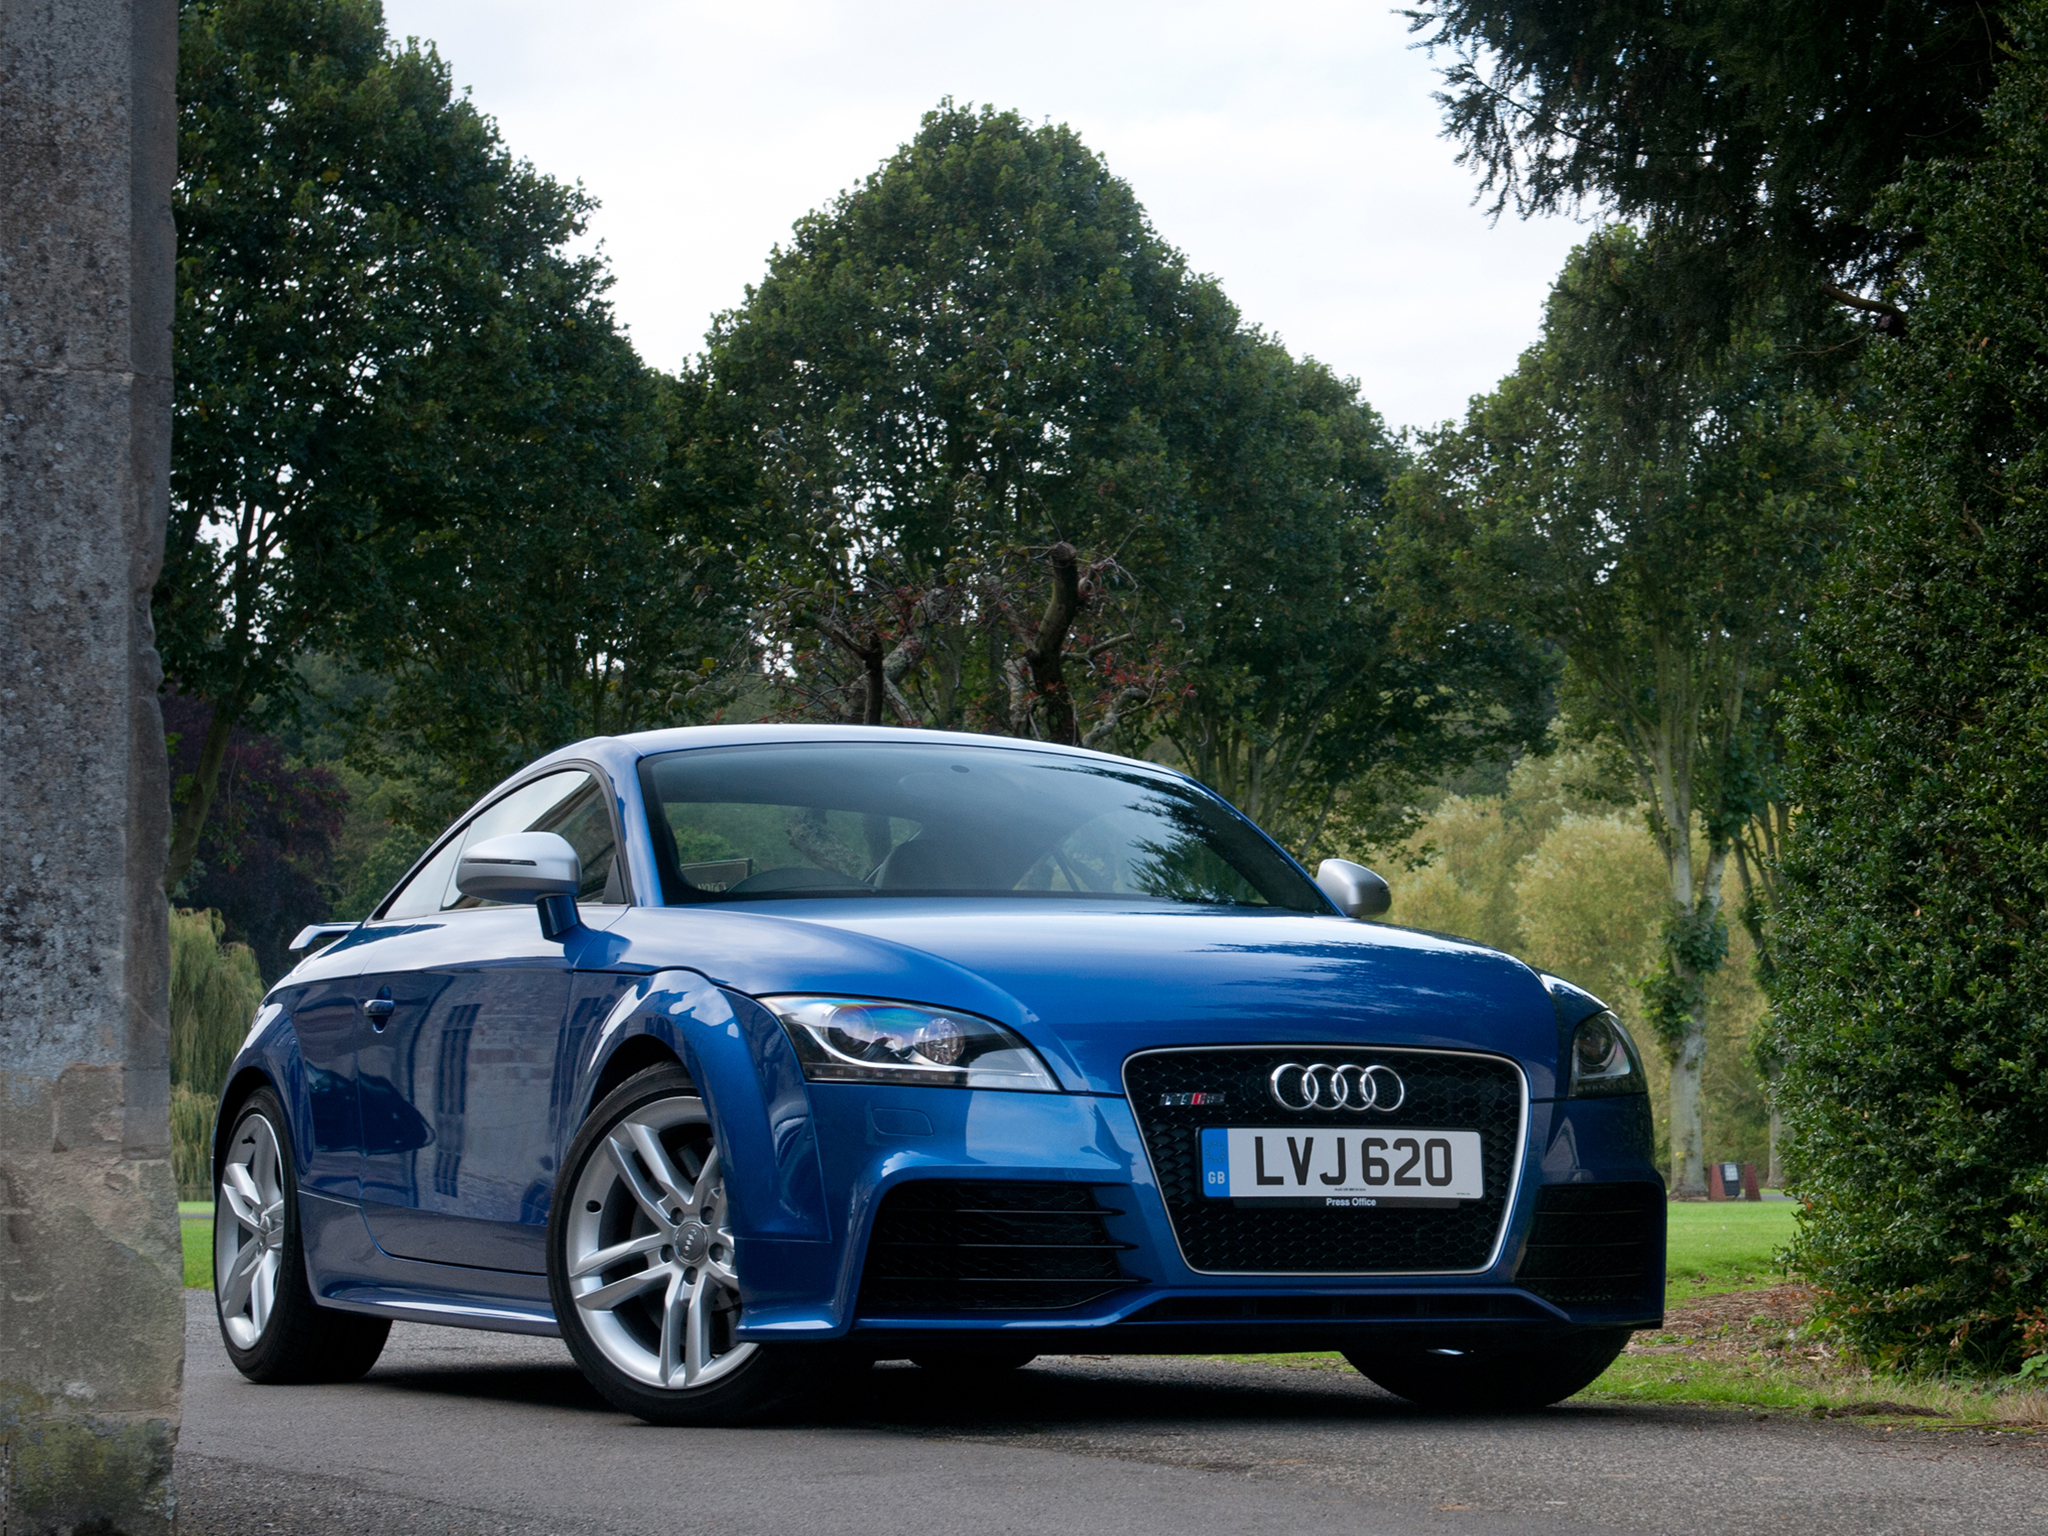 Audi TT RS plus Coupe UK spec Wallpapers Cool Cars Wallpaper 2048x1536